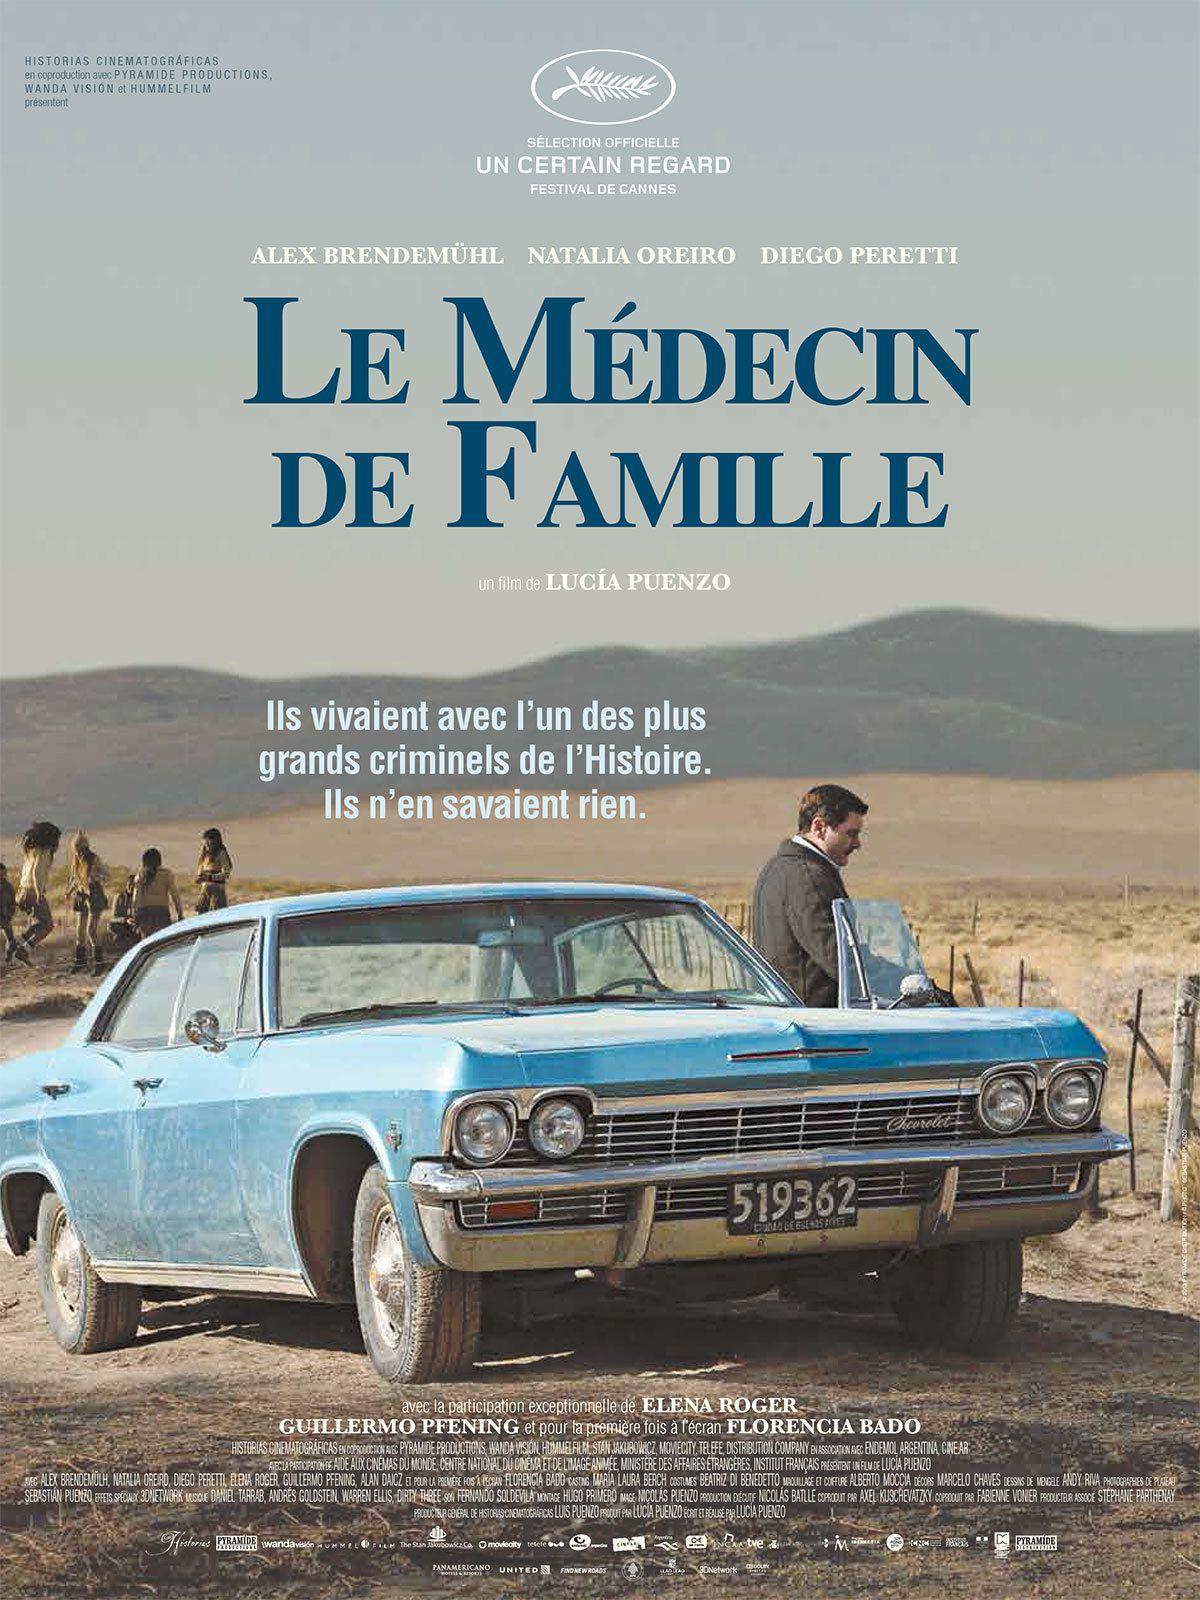 Le Médecin de famille - Film (2013)